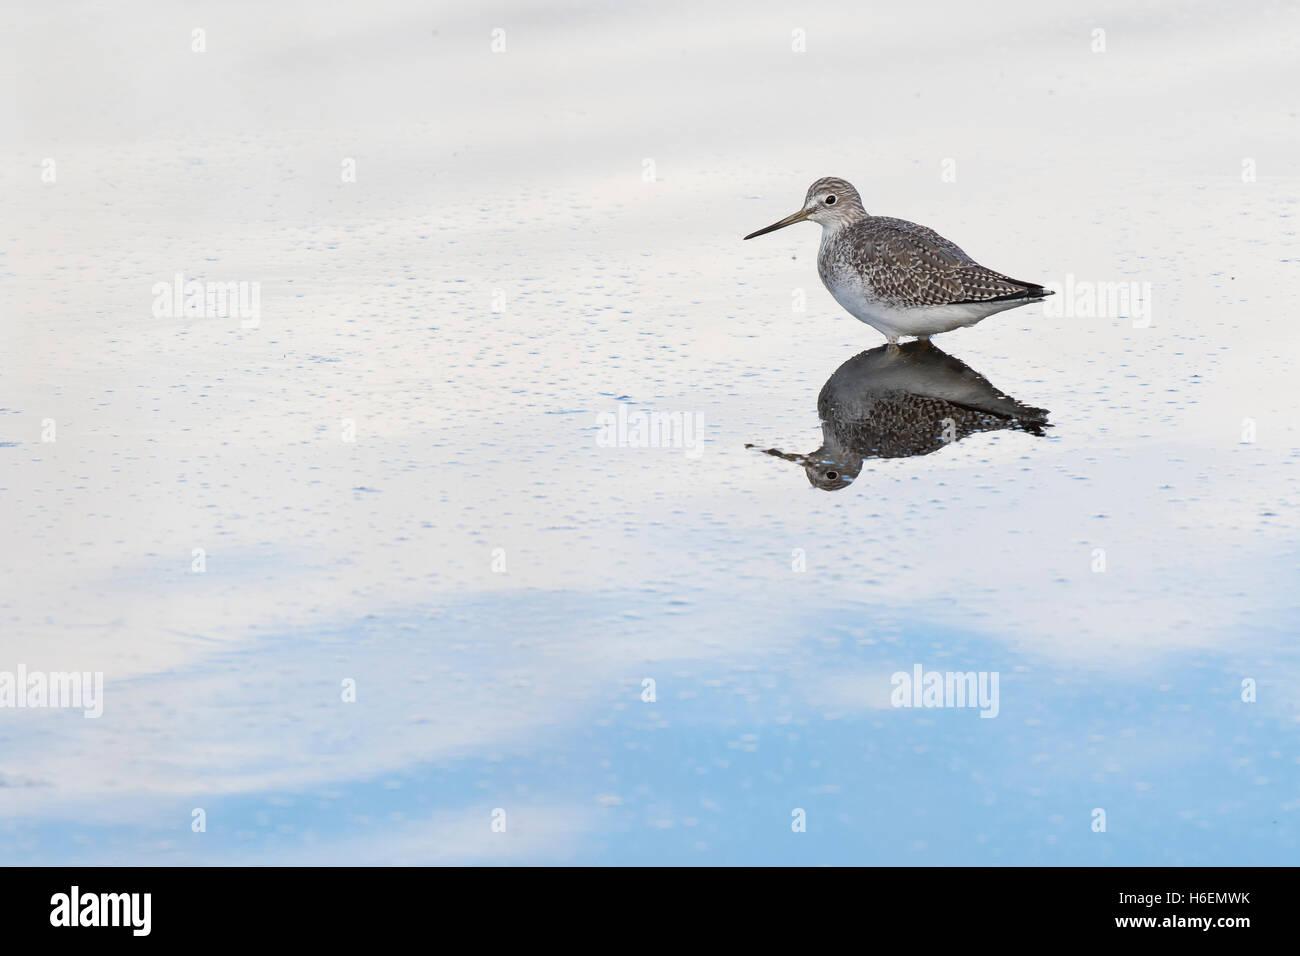 Sandpiper, sandpipers, Tringa melanoleuca, greater yellow legs, bird, shorebird feeding in pond in Washington state, - Stock Image